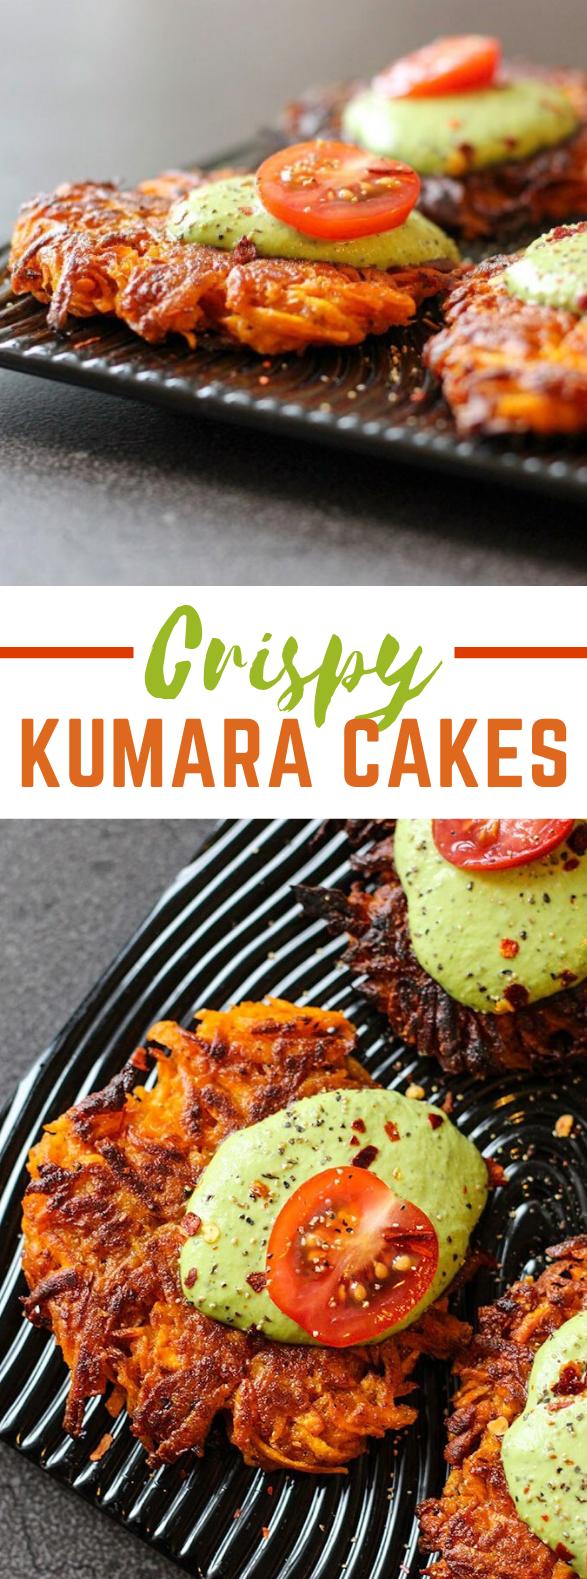 CRISPY KUMARA CAKES #vegetarian #sandwiches